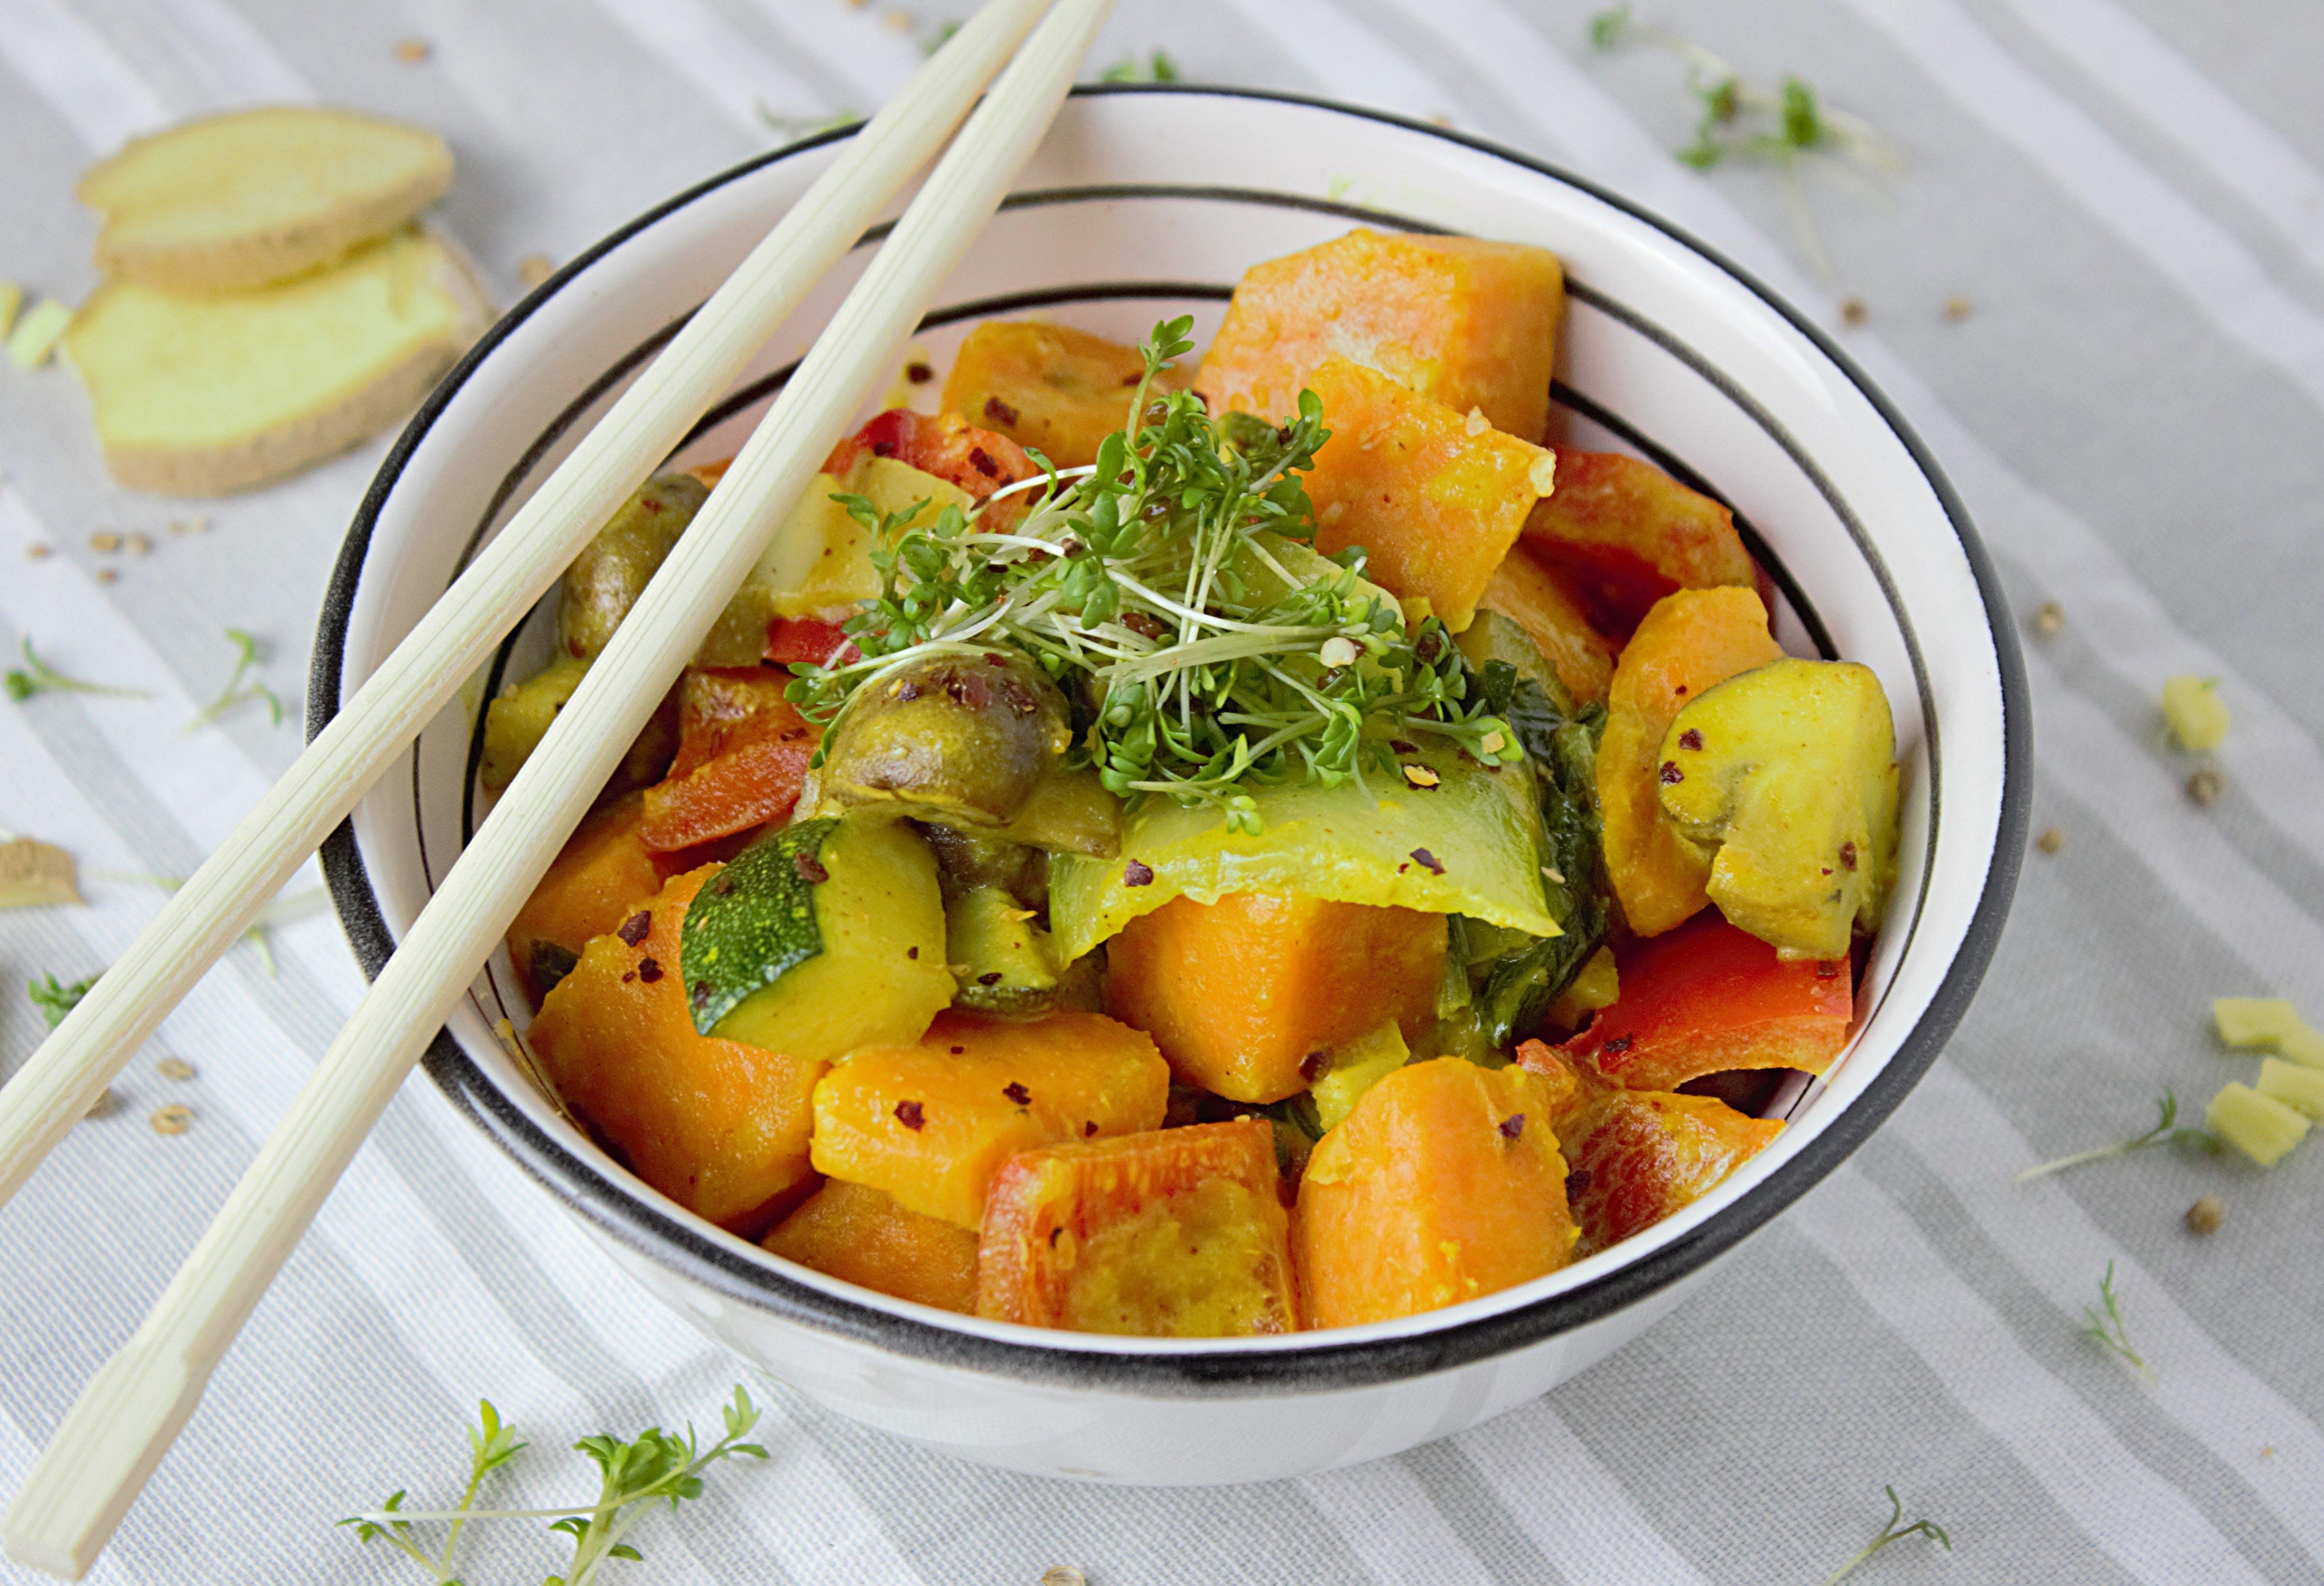 Chopstick on Bowl With Salad Inside